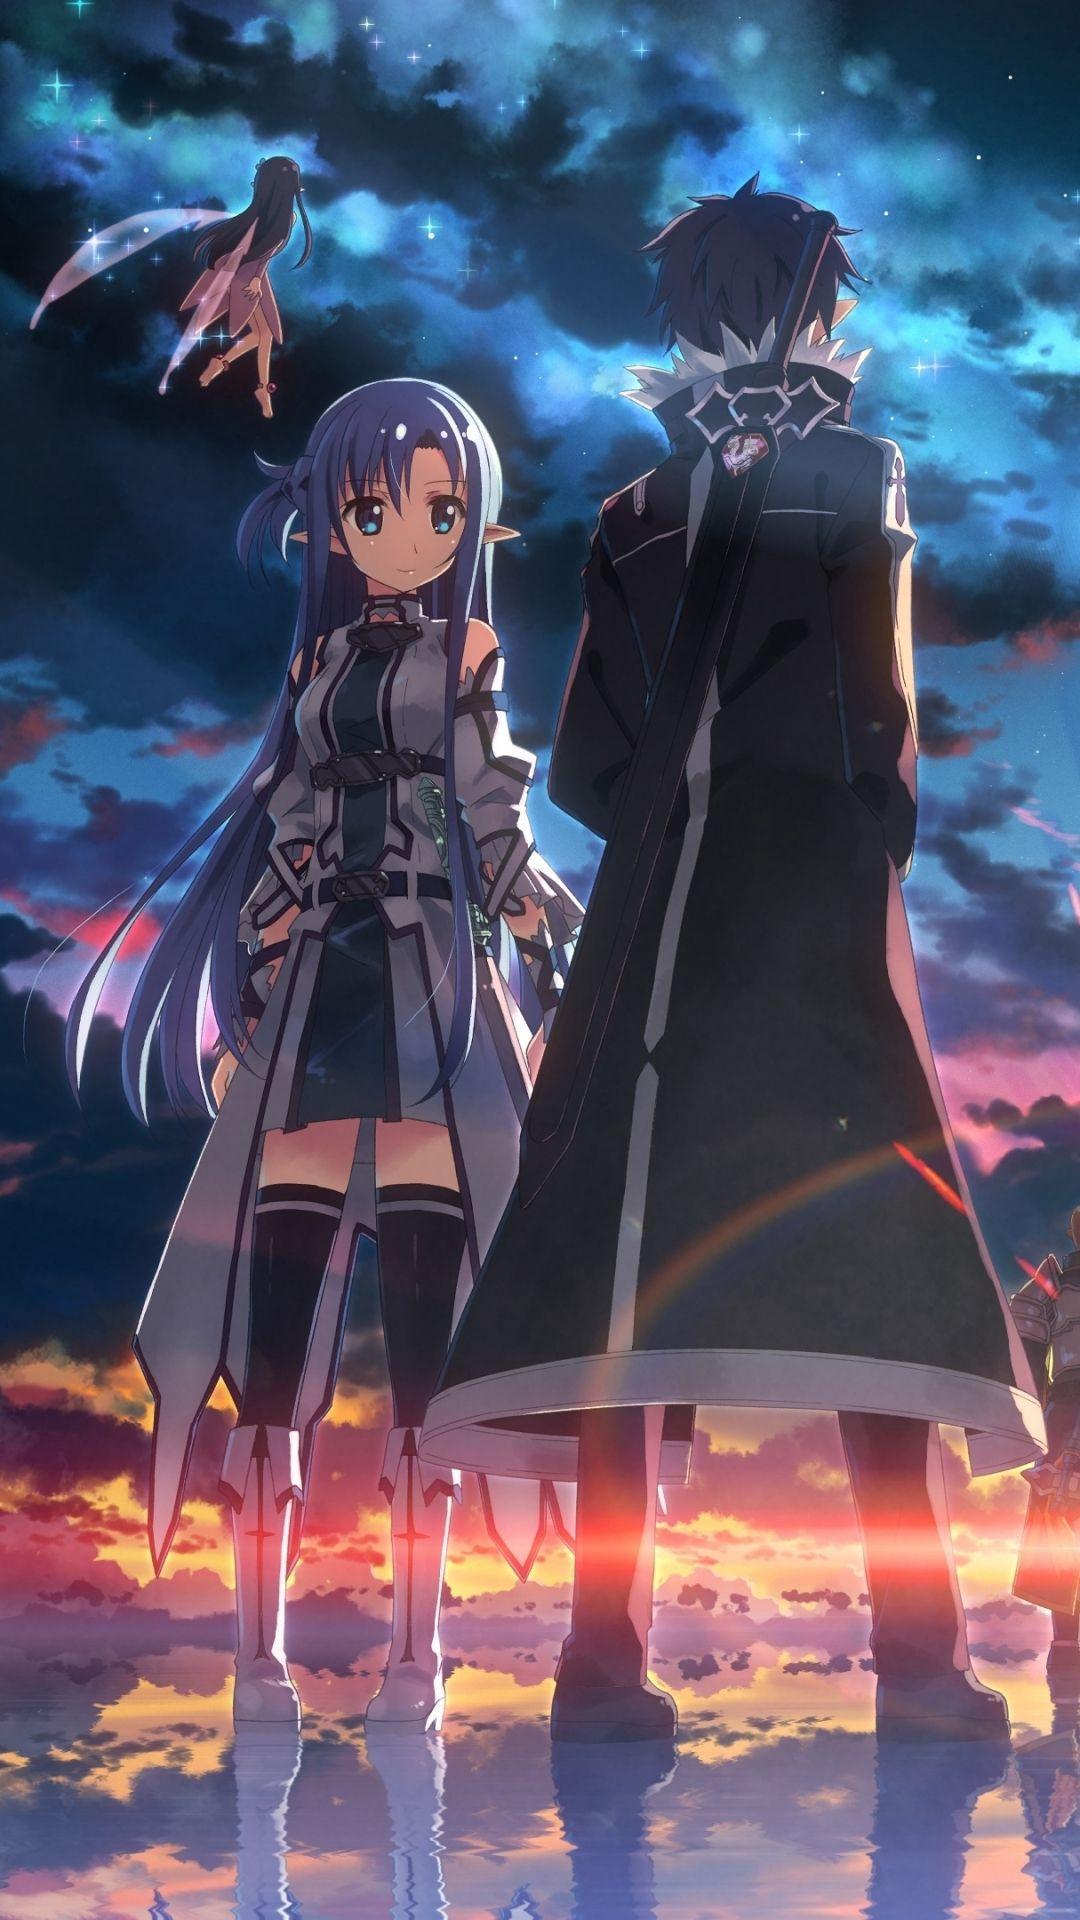 Download 95 Wallpaper Anime Hd Sao Terbaik